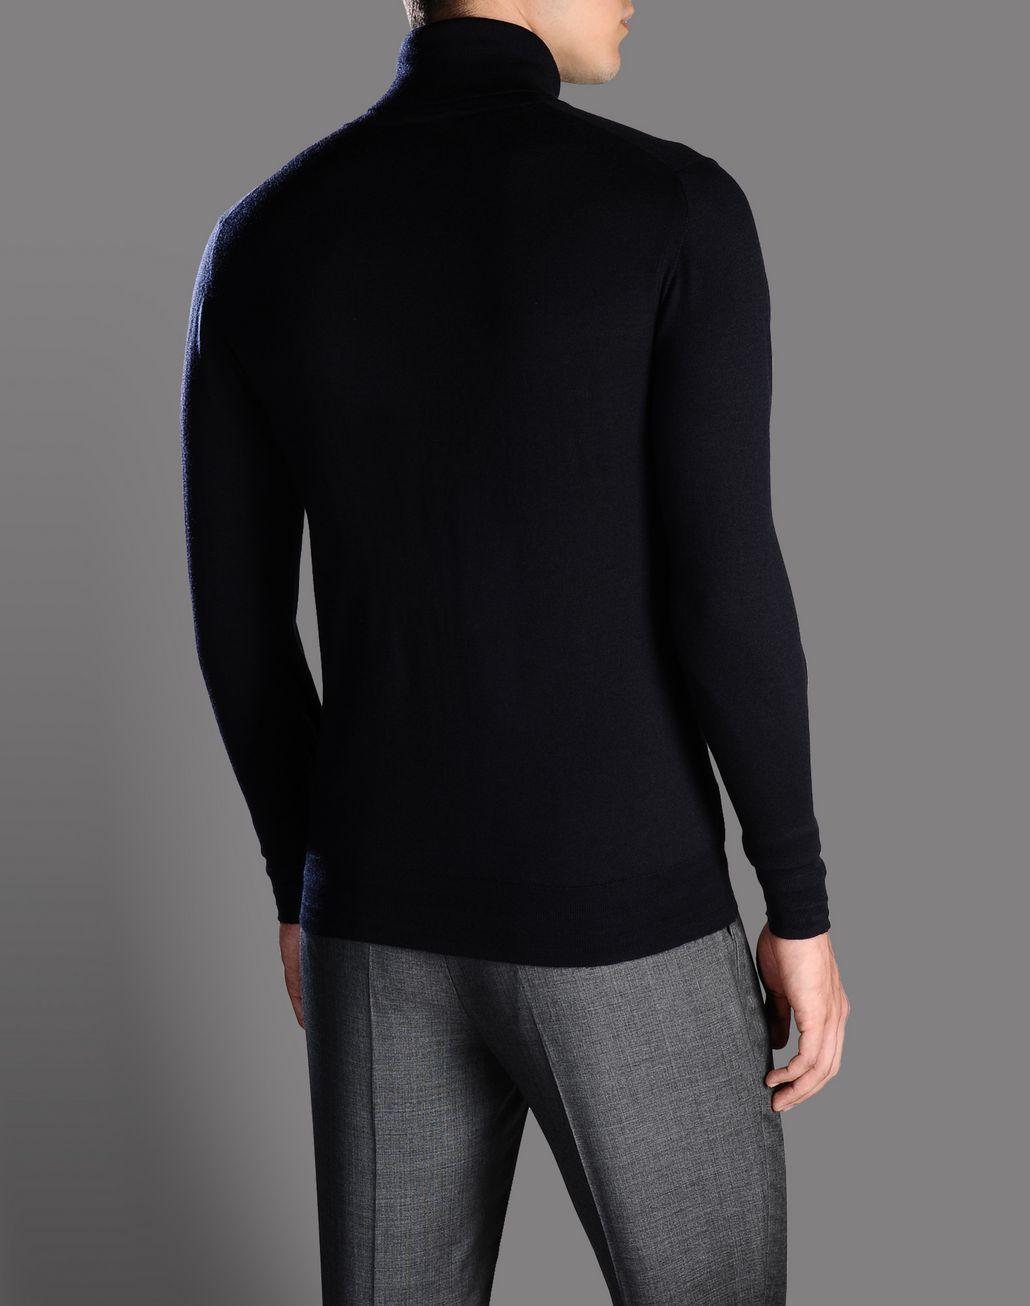 BRIONI cashmere and silk turtleneck Knitwear U r